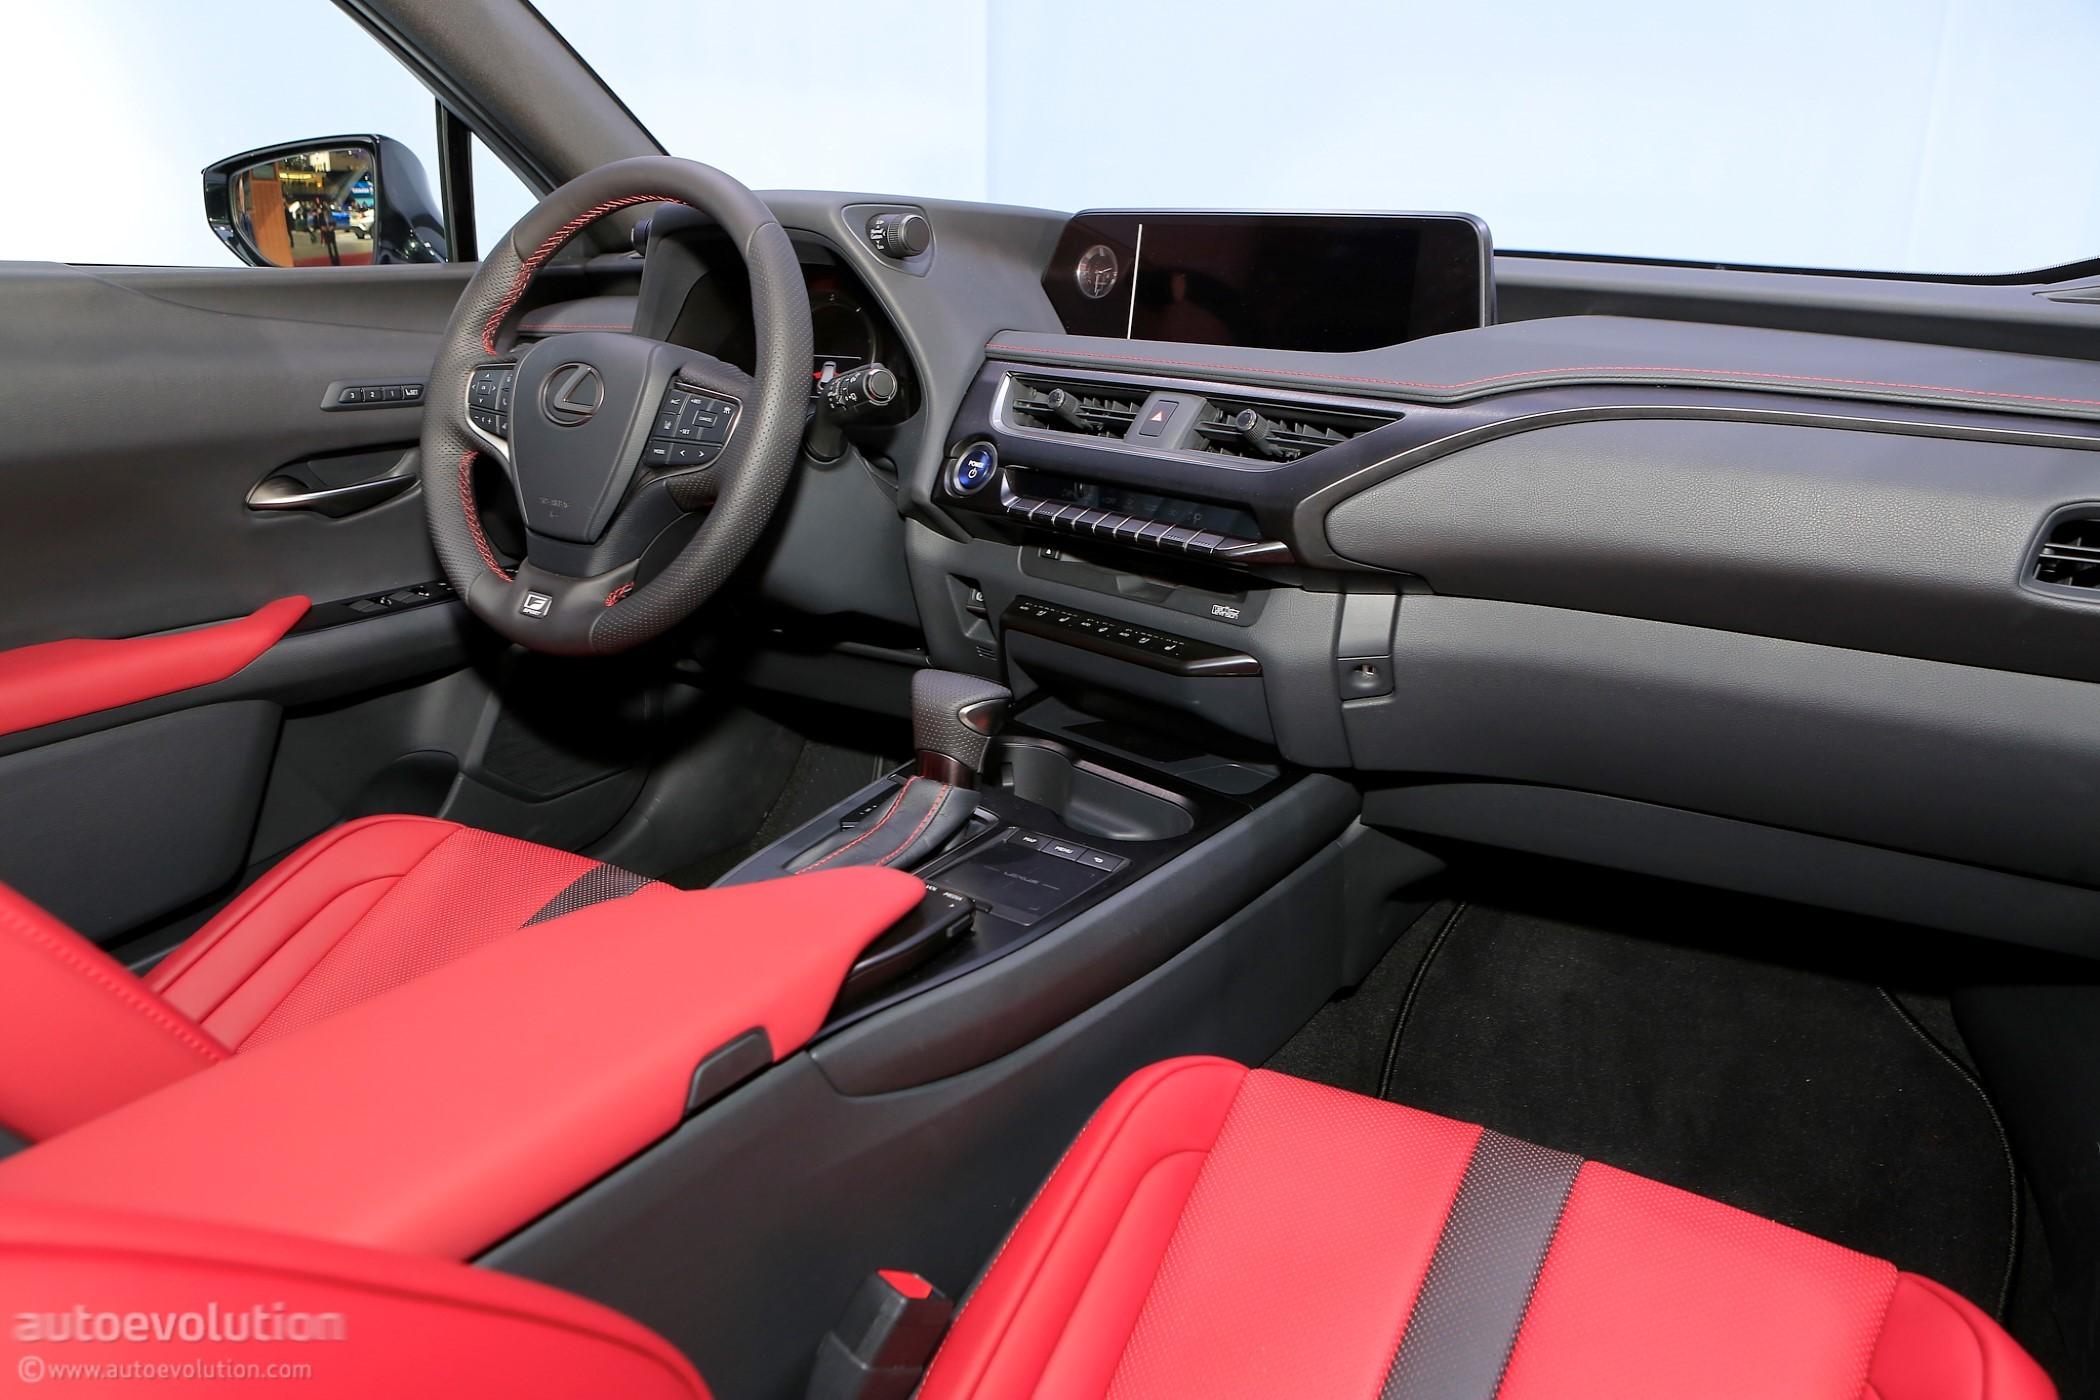 How to Enter You Lexus When Key Fob Dies - autoevolution